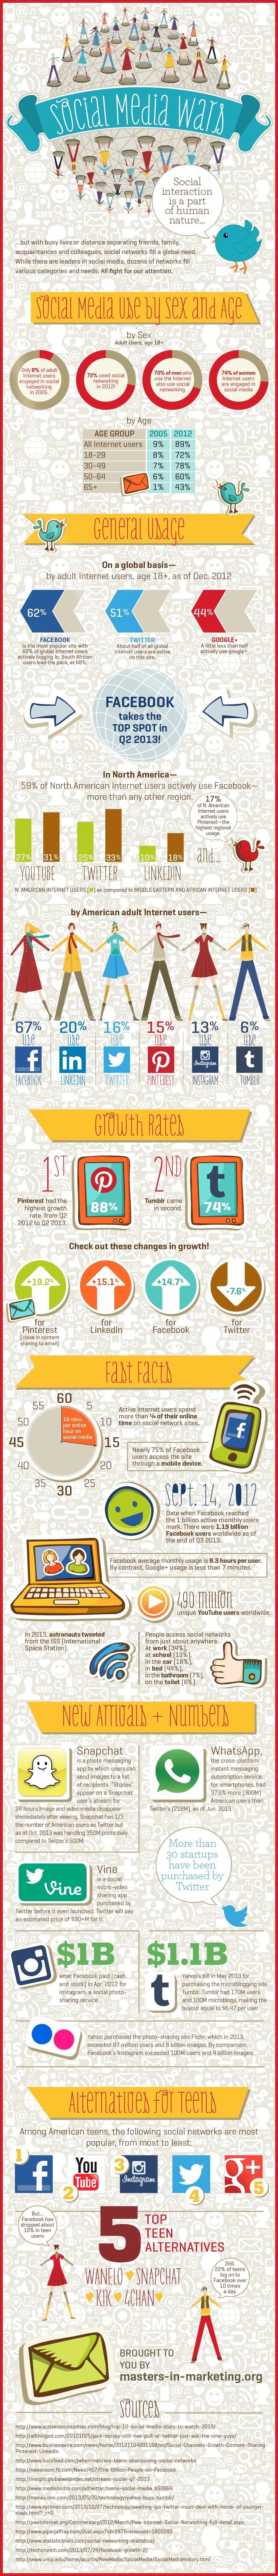 social media usage infographic